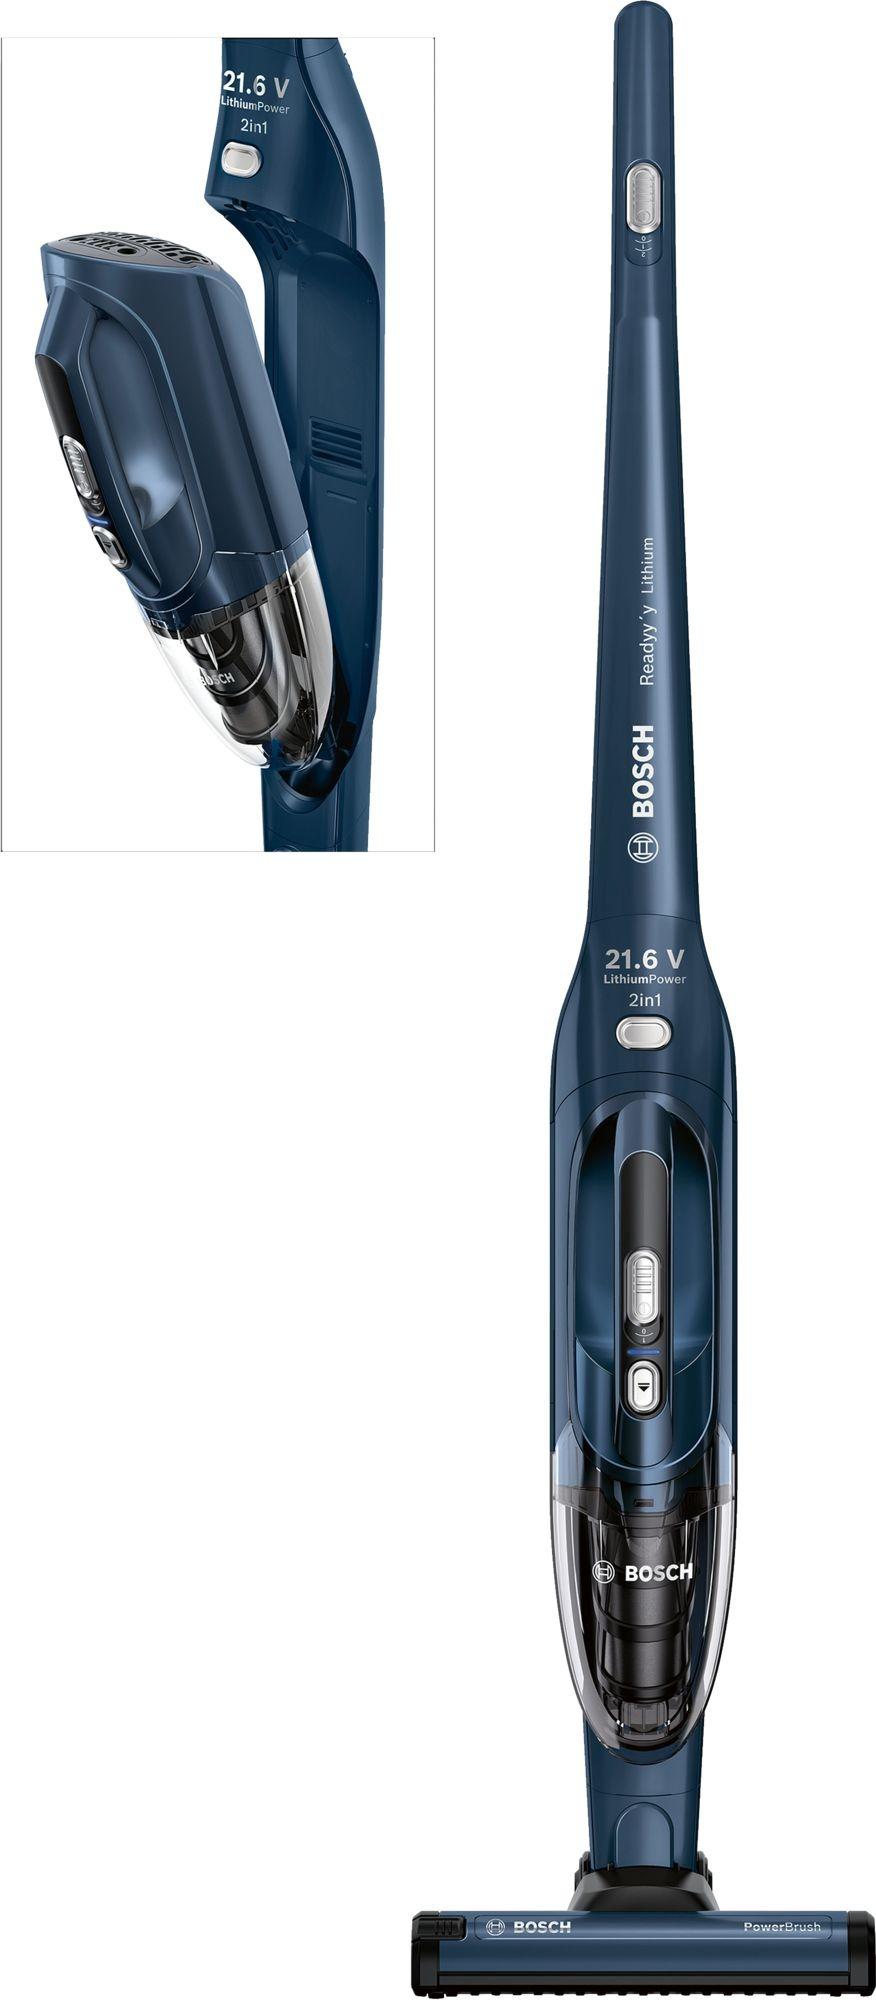 Bosch steelstofzuiger BBHL22140 blauw